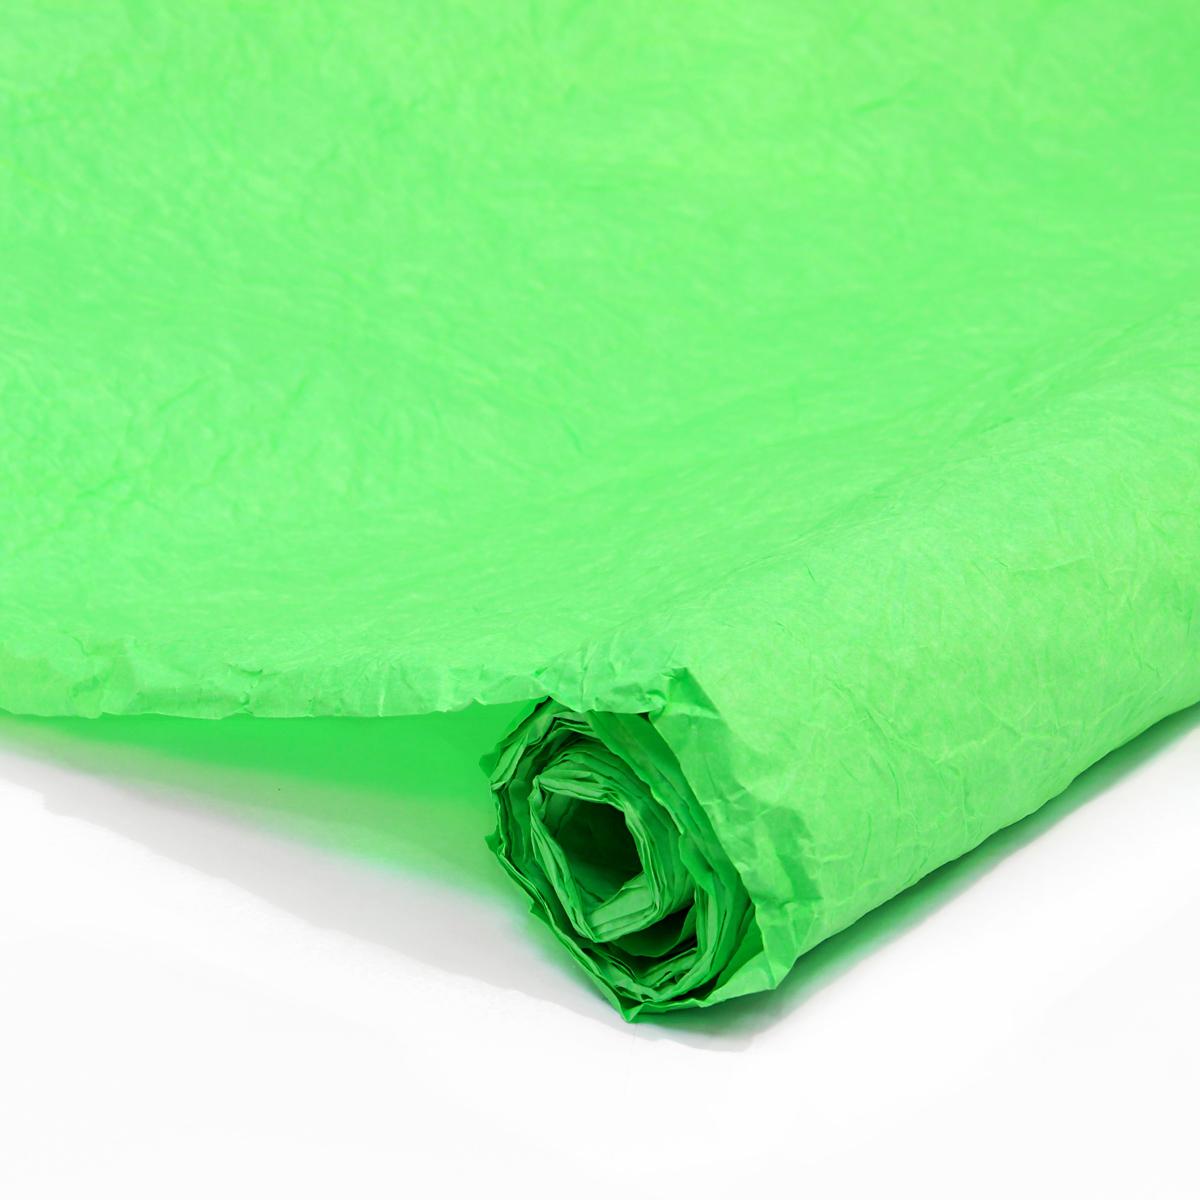 Бумага упаковочная Veld-Co Эколюкc, цвет: салатовый, 70 см х 5 м коробка подарочная veld co giftbox трансформер белые розы цвет разноцветный 17 5 х 17 5 х 17 см